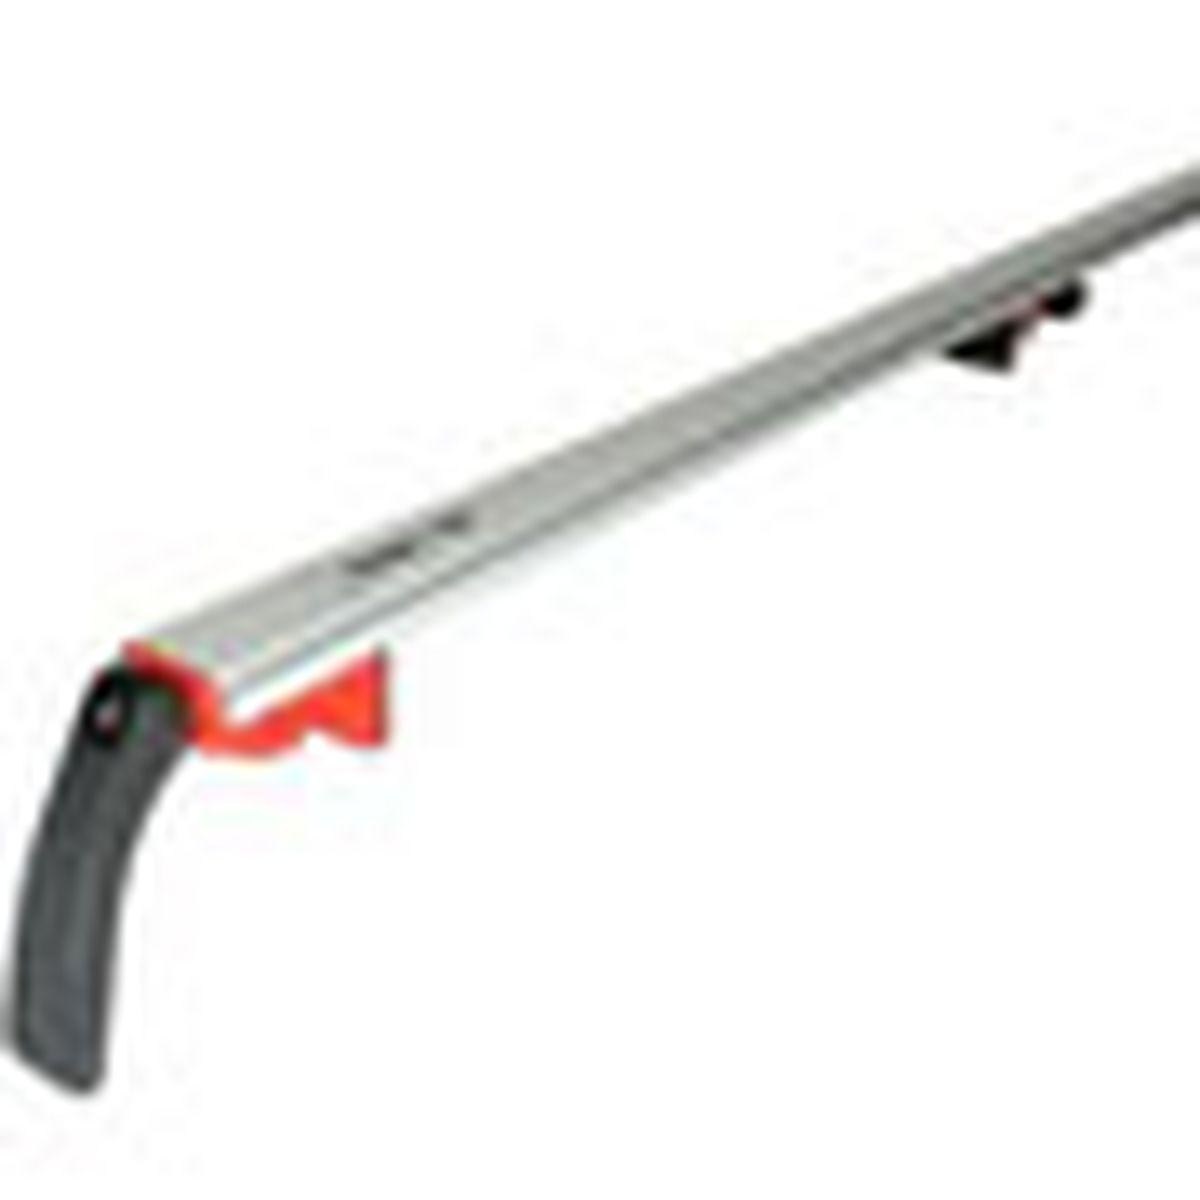 straightedge clamp